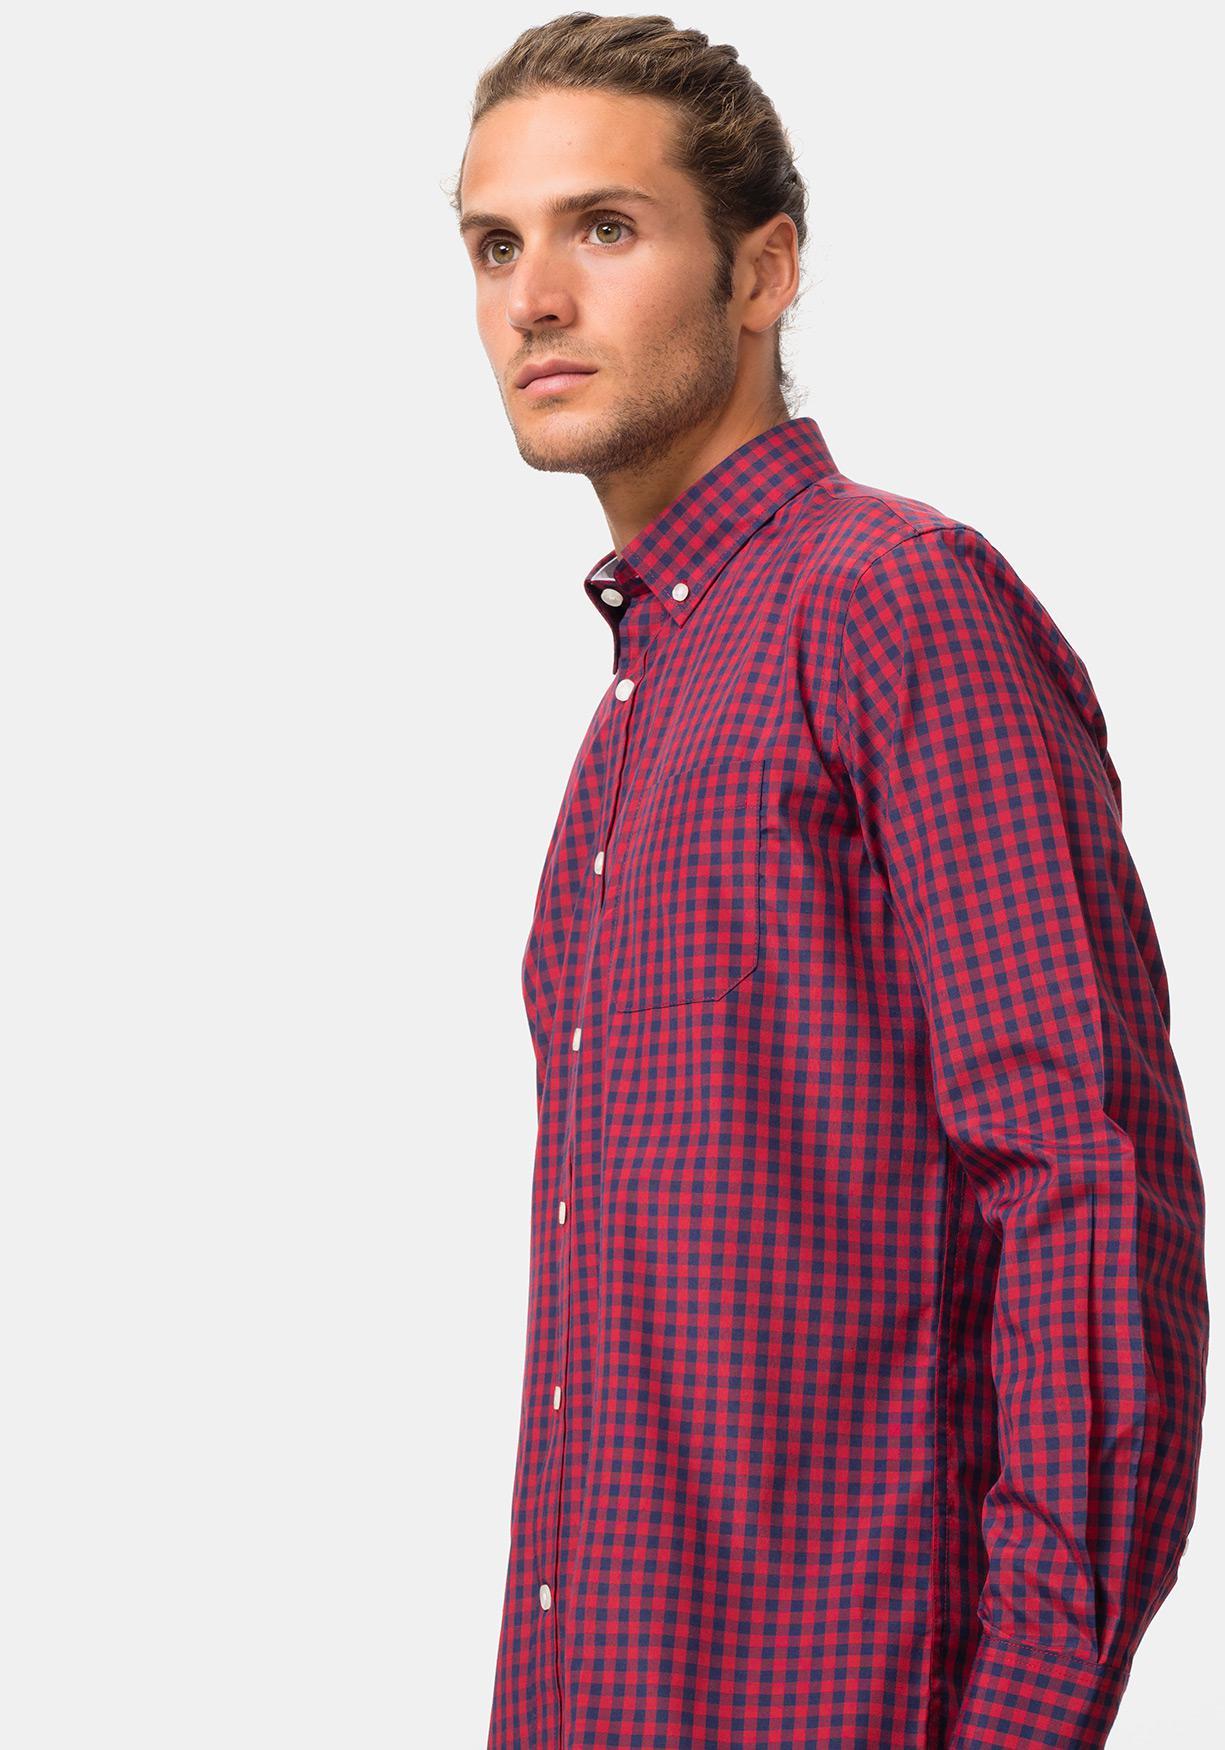 596e186a6541b Comprar Camisa de manga larga TEX. ¡Aprovéchate de nuestros precios ...